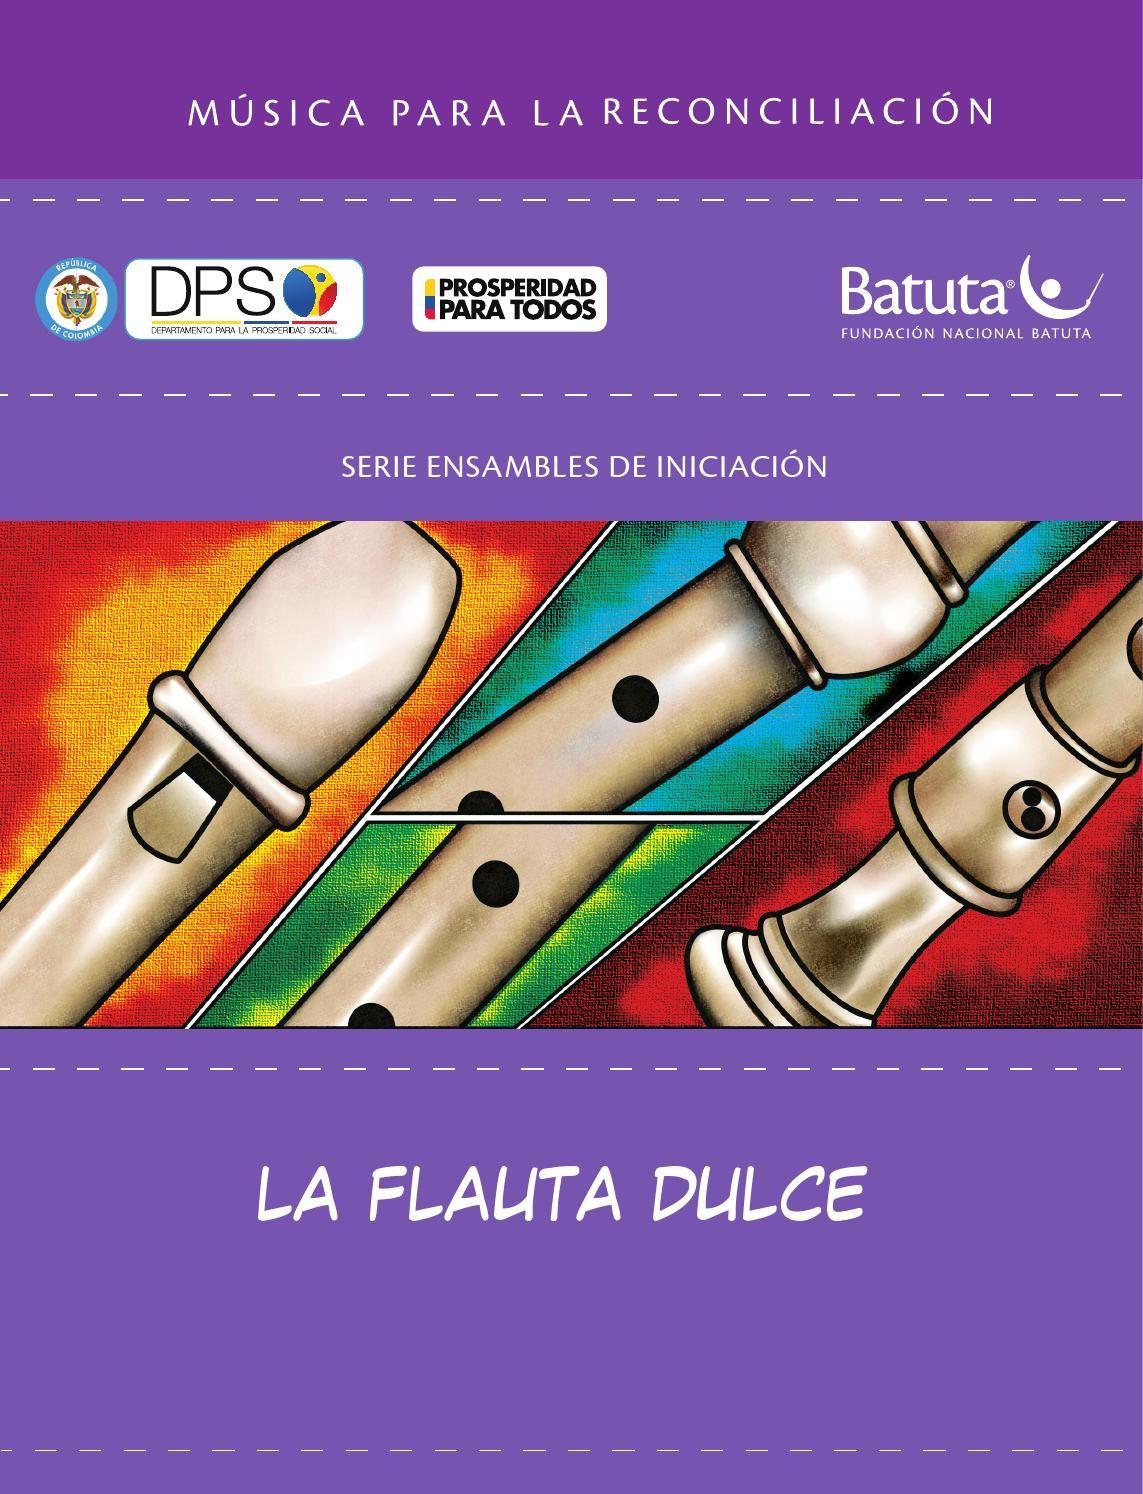 La flauta dulce dps | Flauta, Musica y Musicales